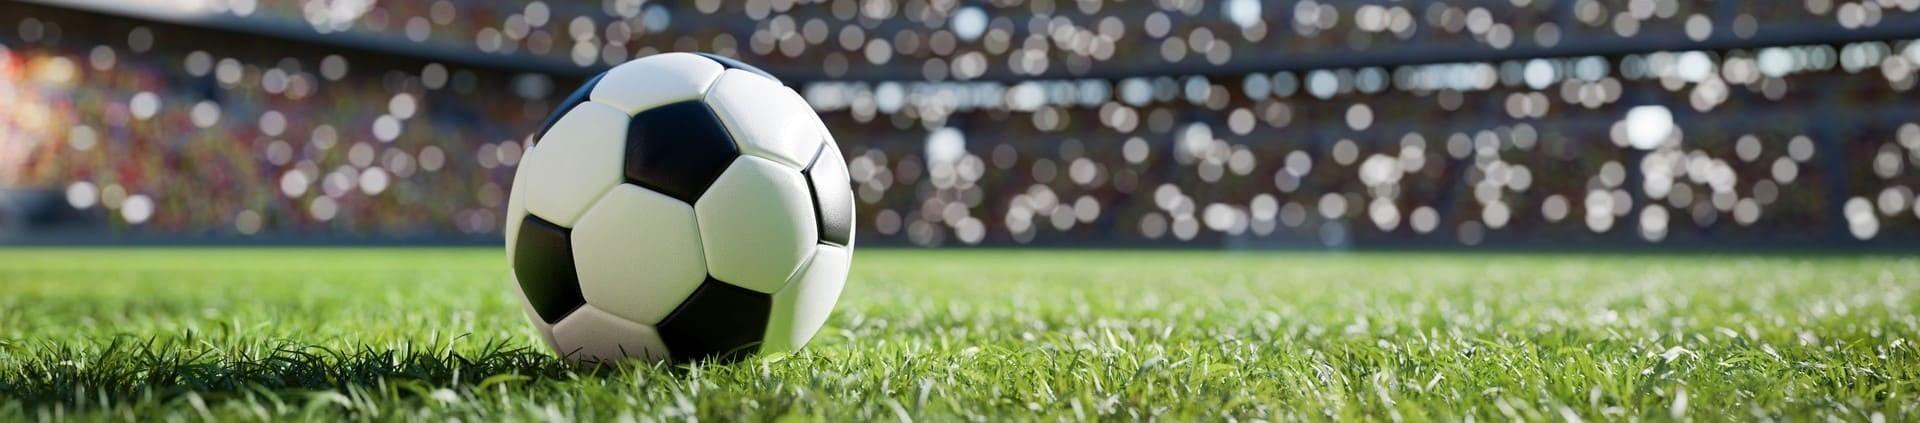 Piłka nożna - Powerman Sport